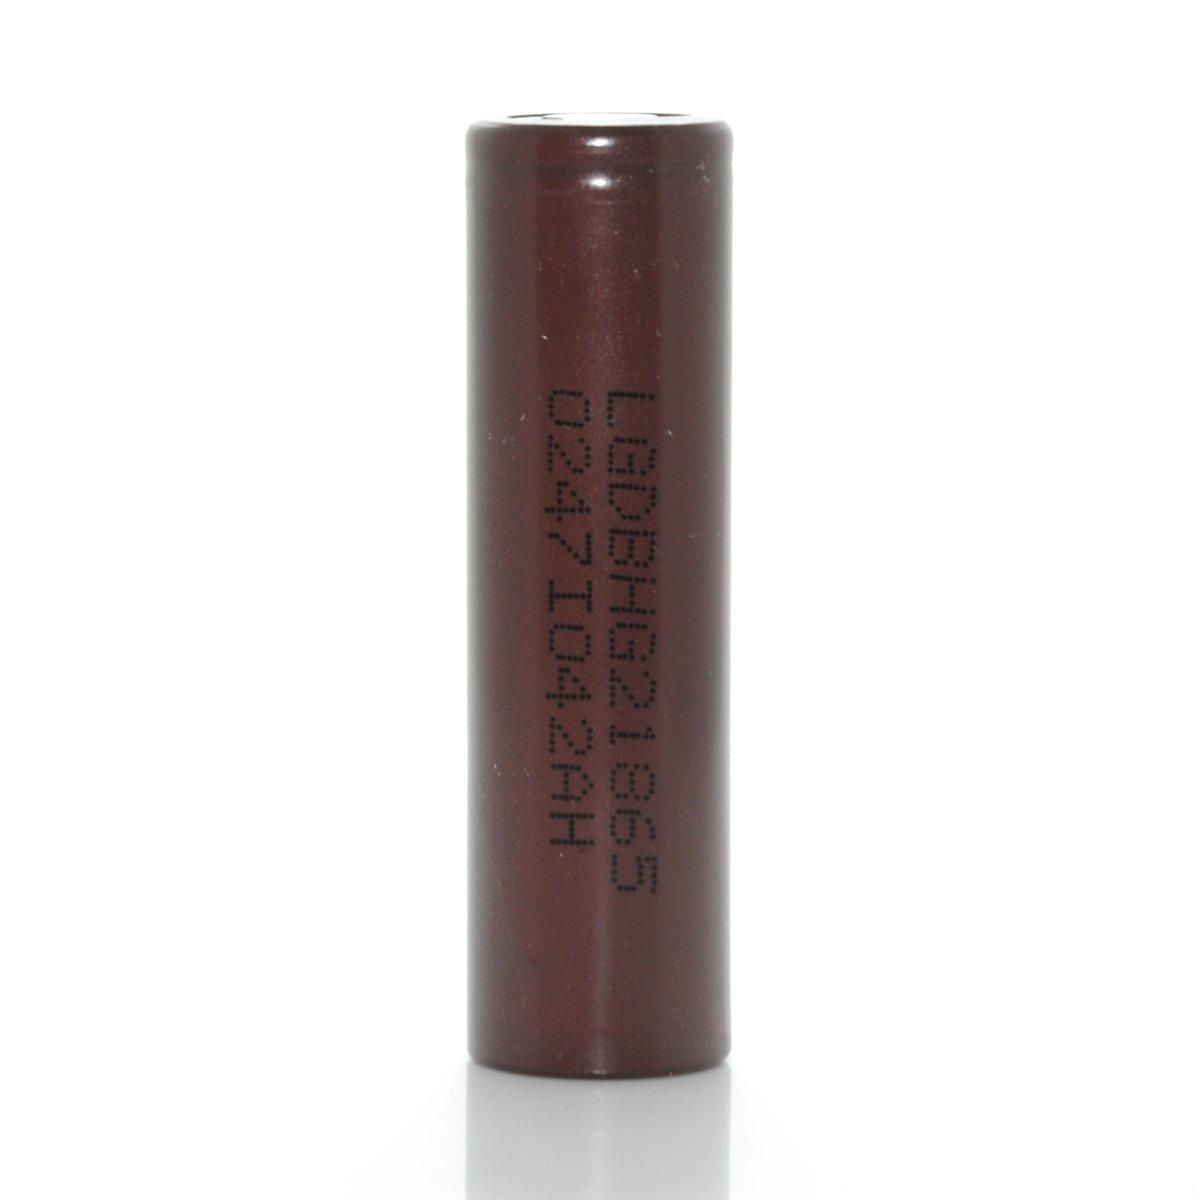 LG HG2 18650 3000mAh Mod Battery